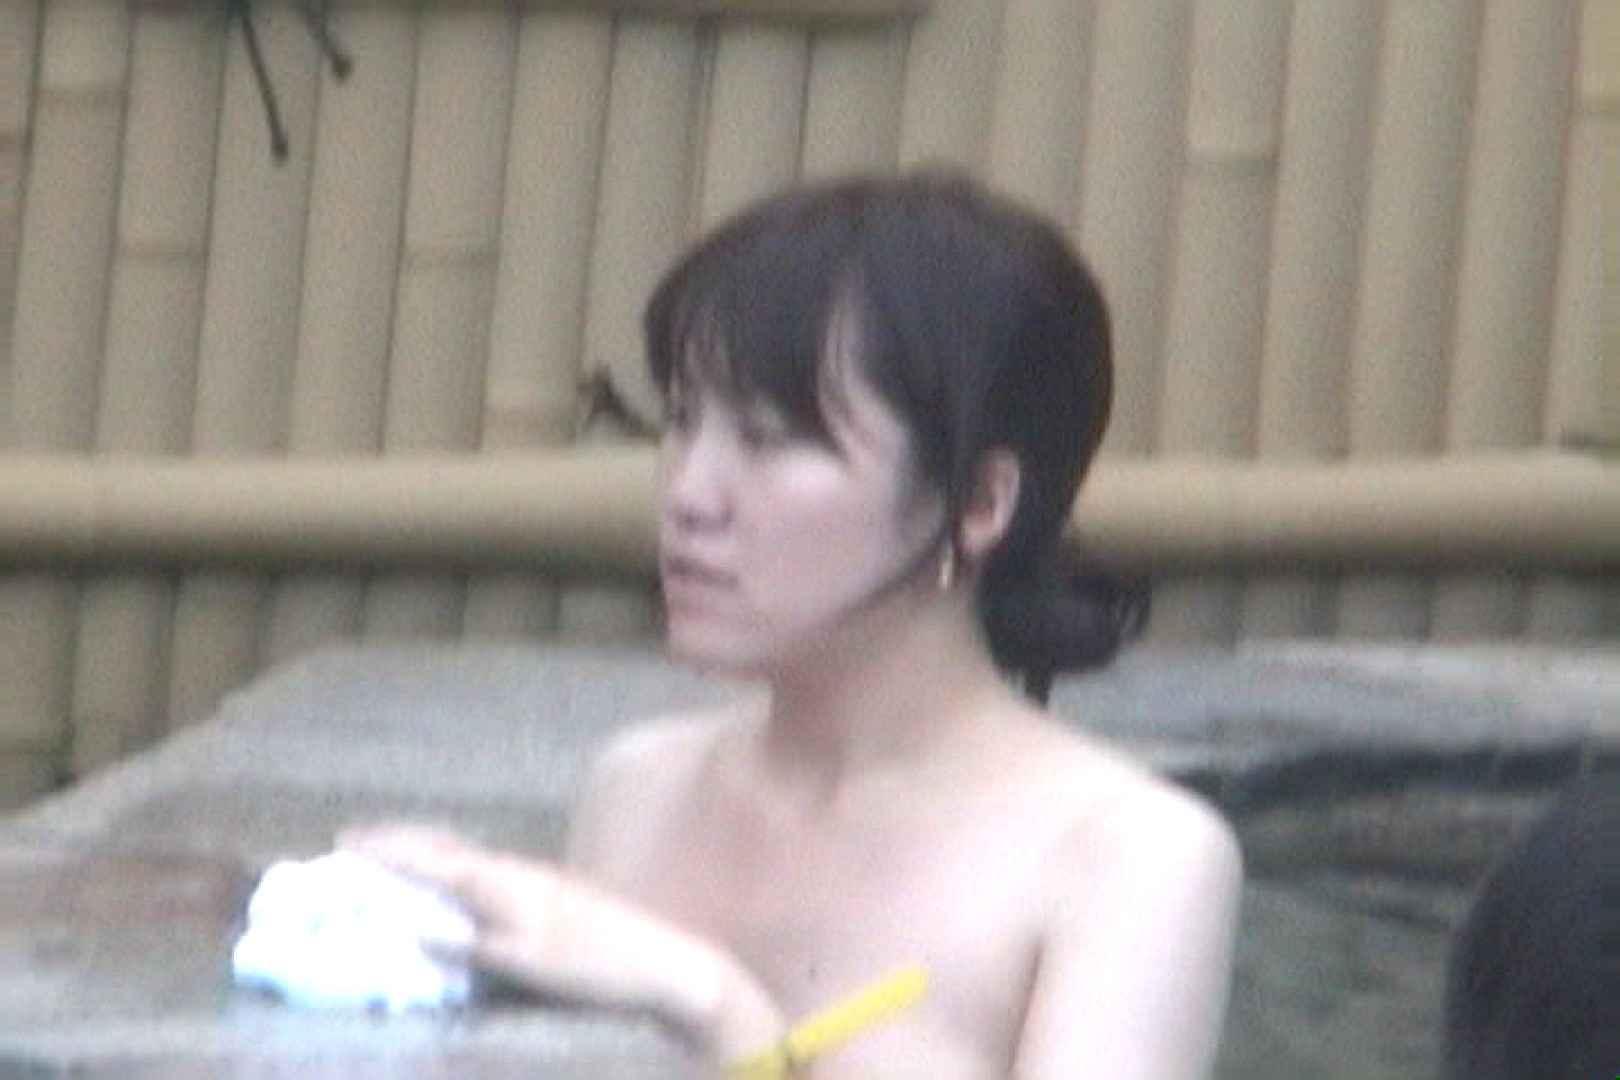 Aquaな露天風呂Vol.79【VIP限定】 盗撮 | HなOL  100pic 74